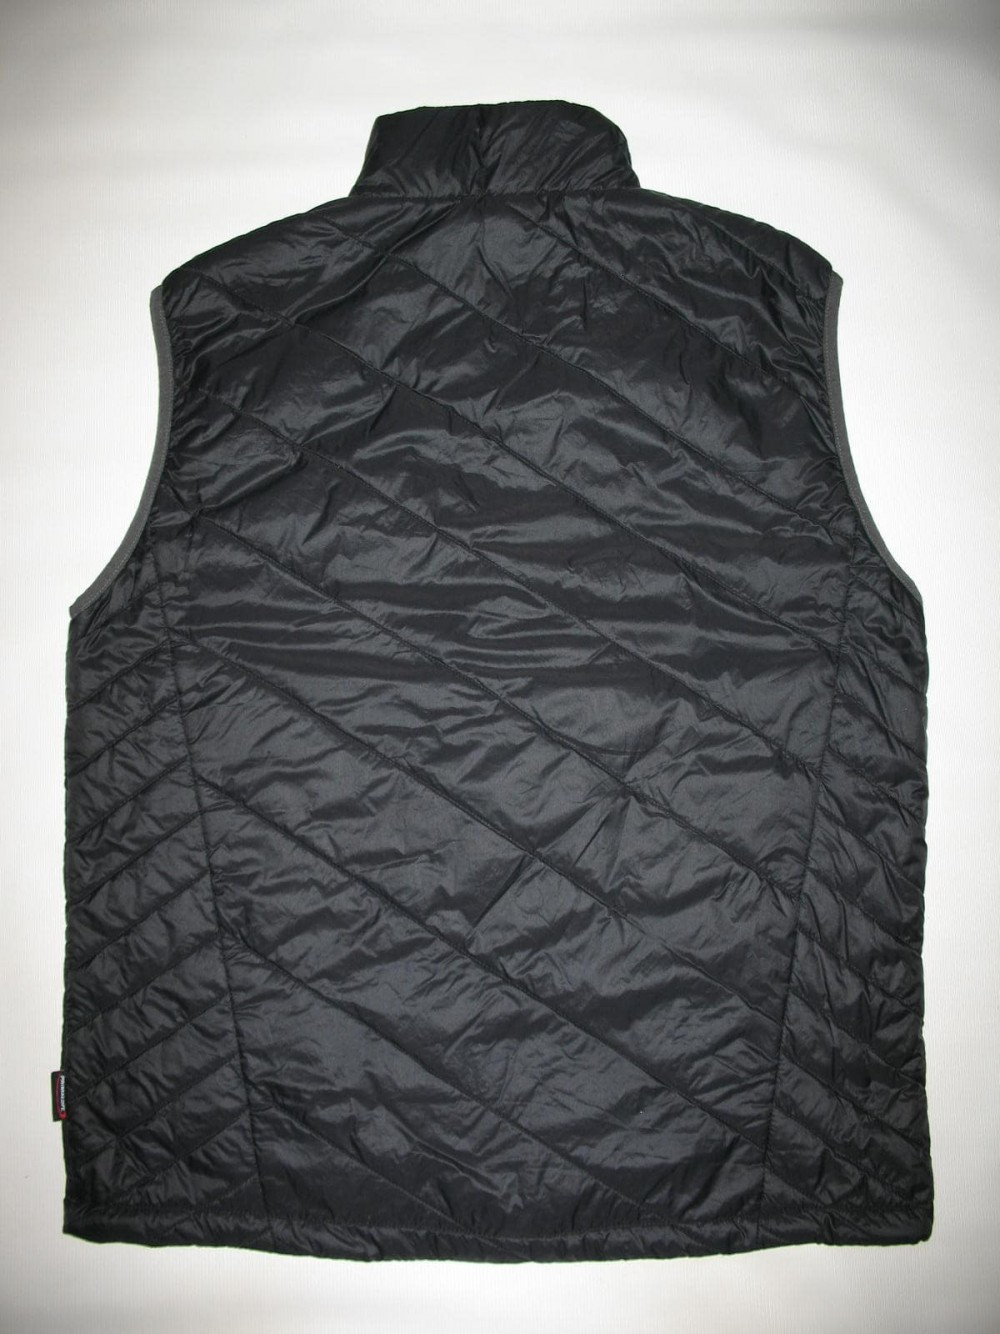 Жилет McKINLEY bellville  primaloft vest (размер XL) - 2